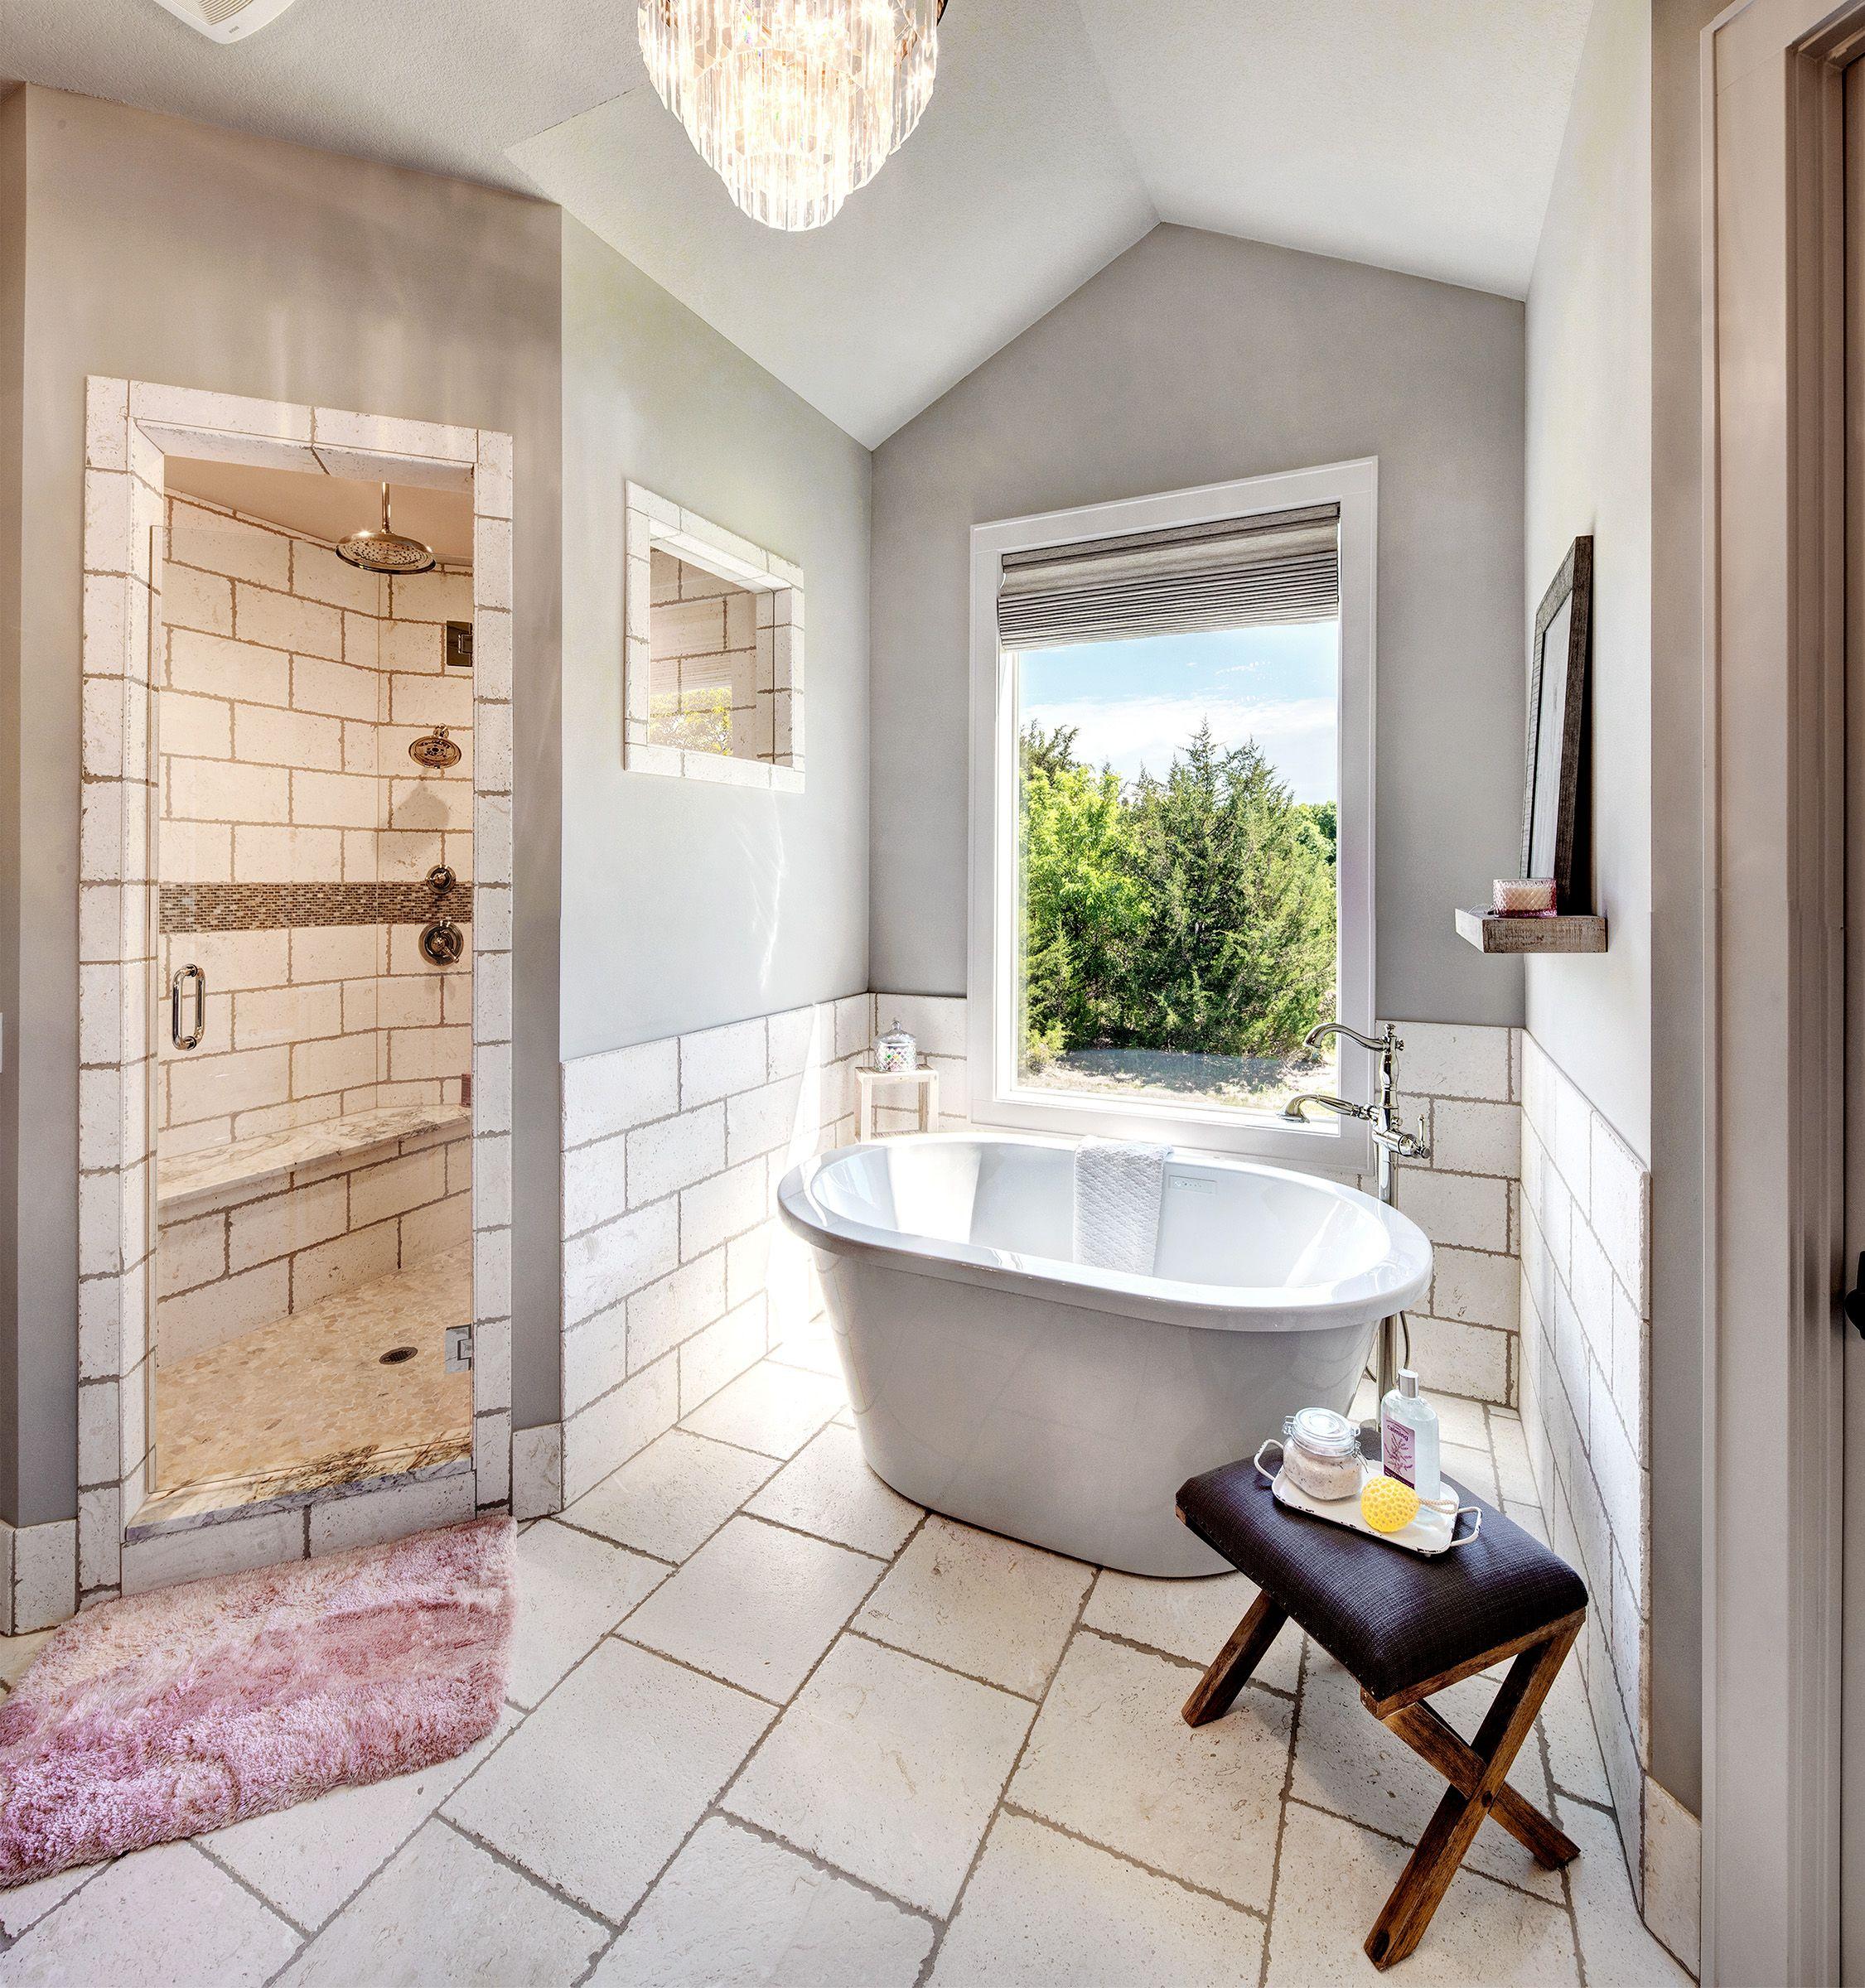 Master Bathroom Walk In Shower Large Window Over Bathtub